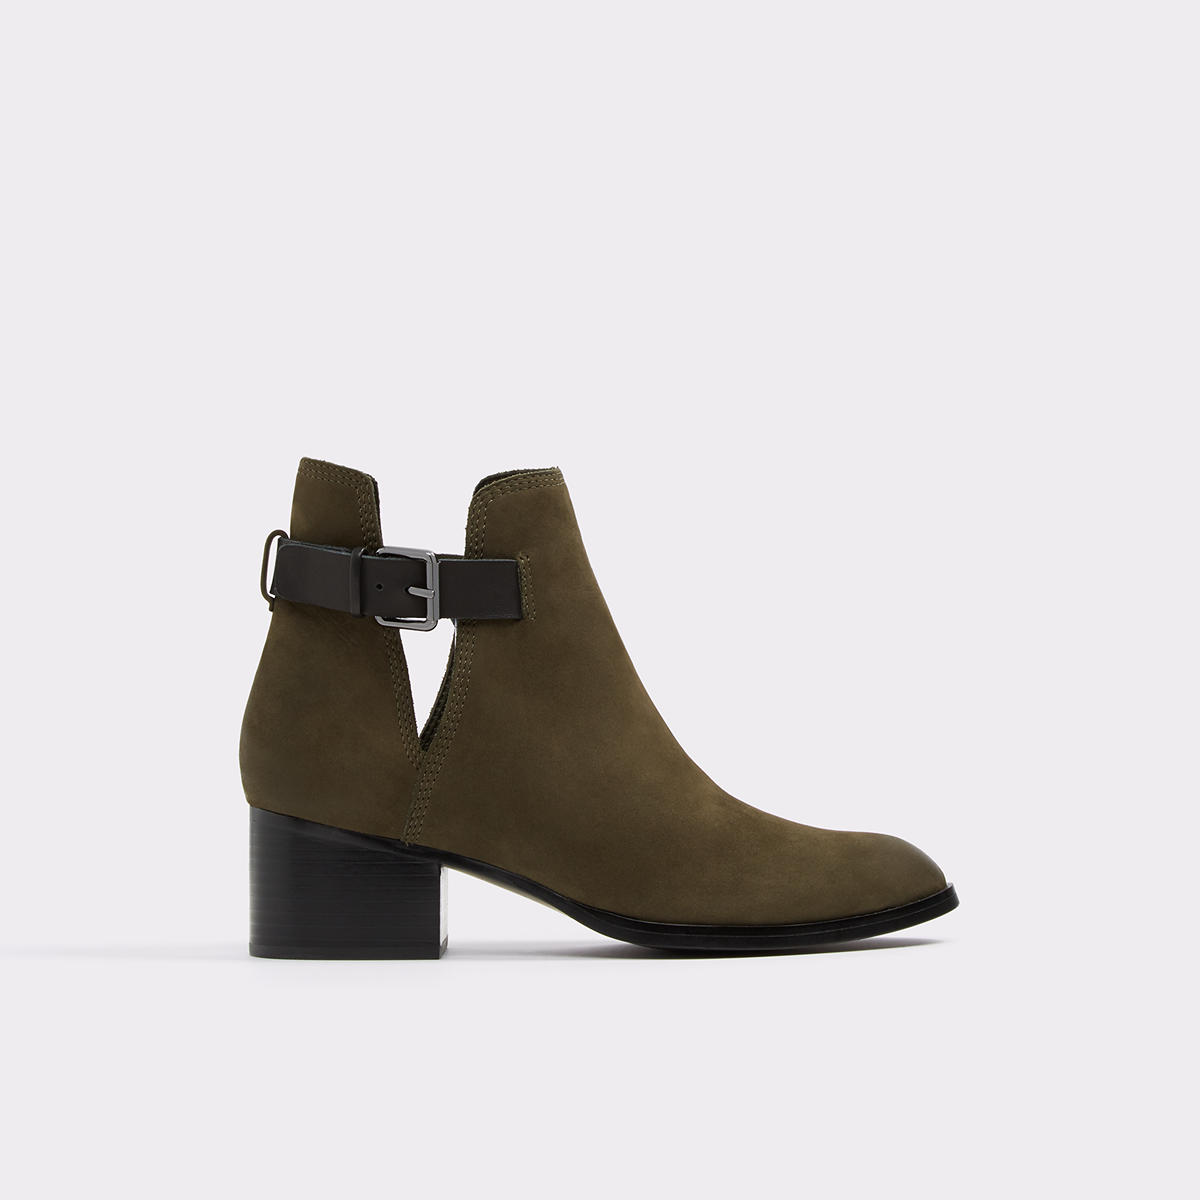 Ultra Ankle Boots - Beige Aldo swGT3C2o